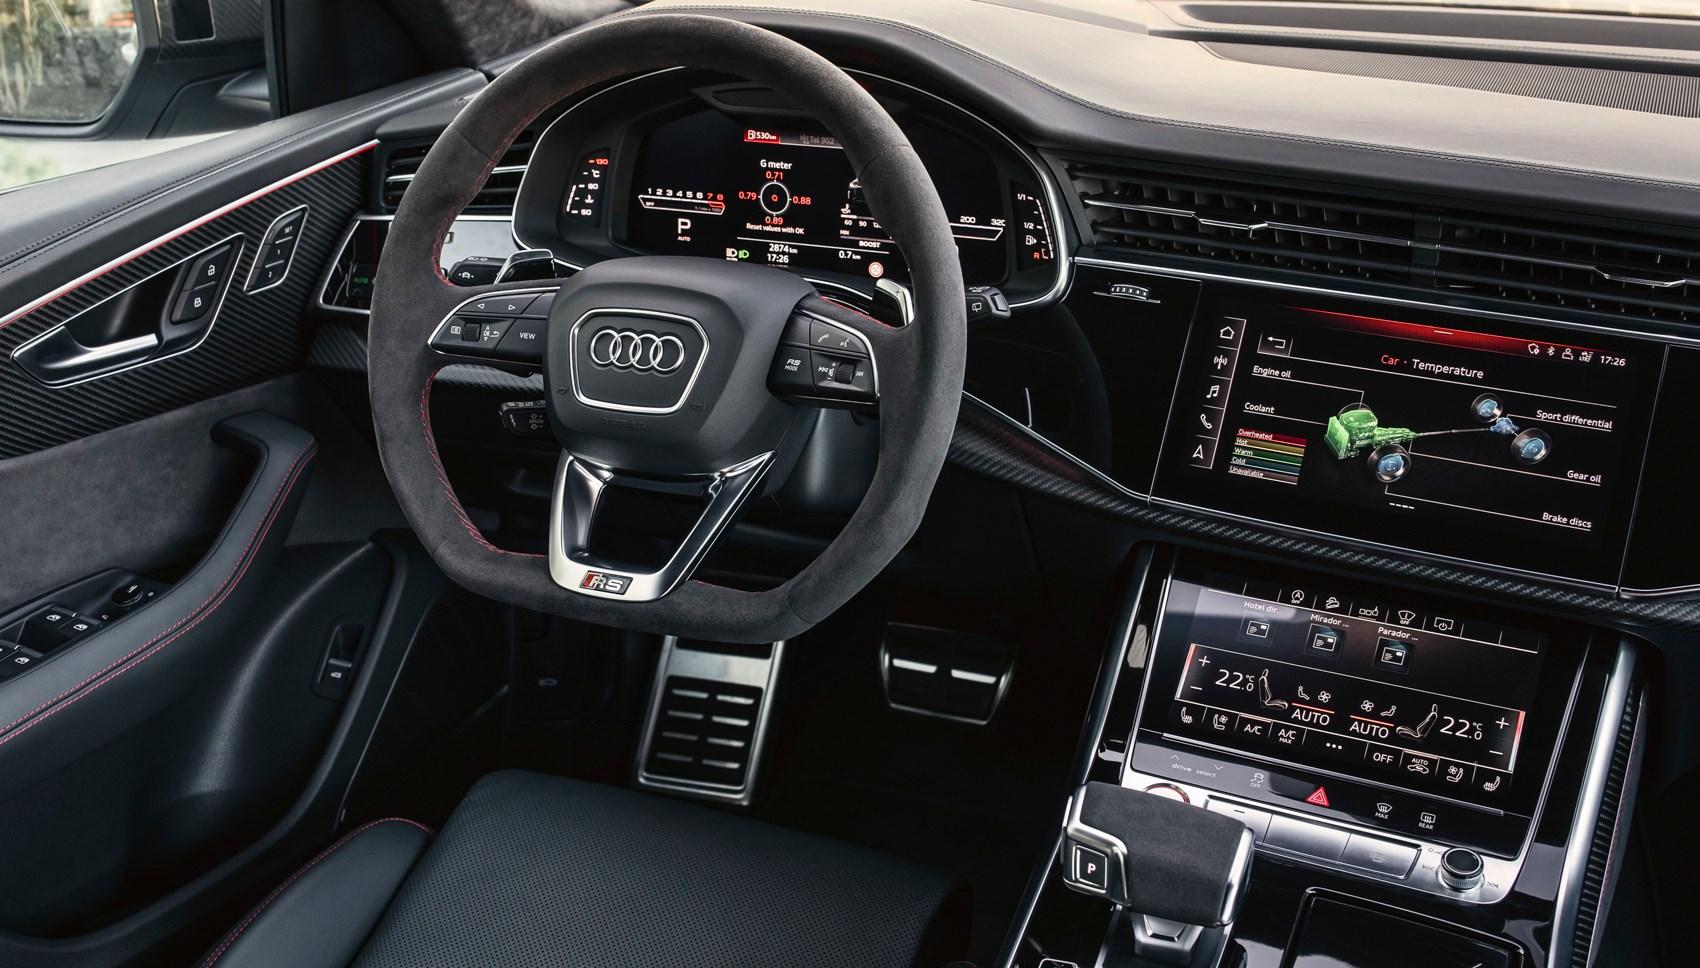 Audi RSQ8 interior